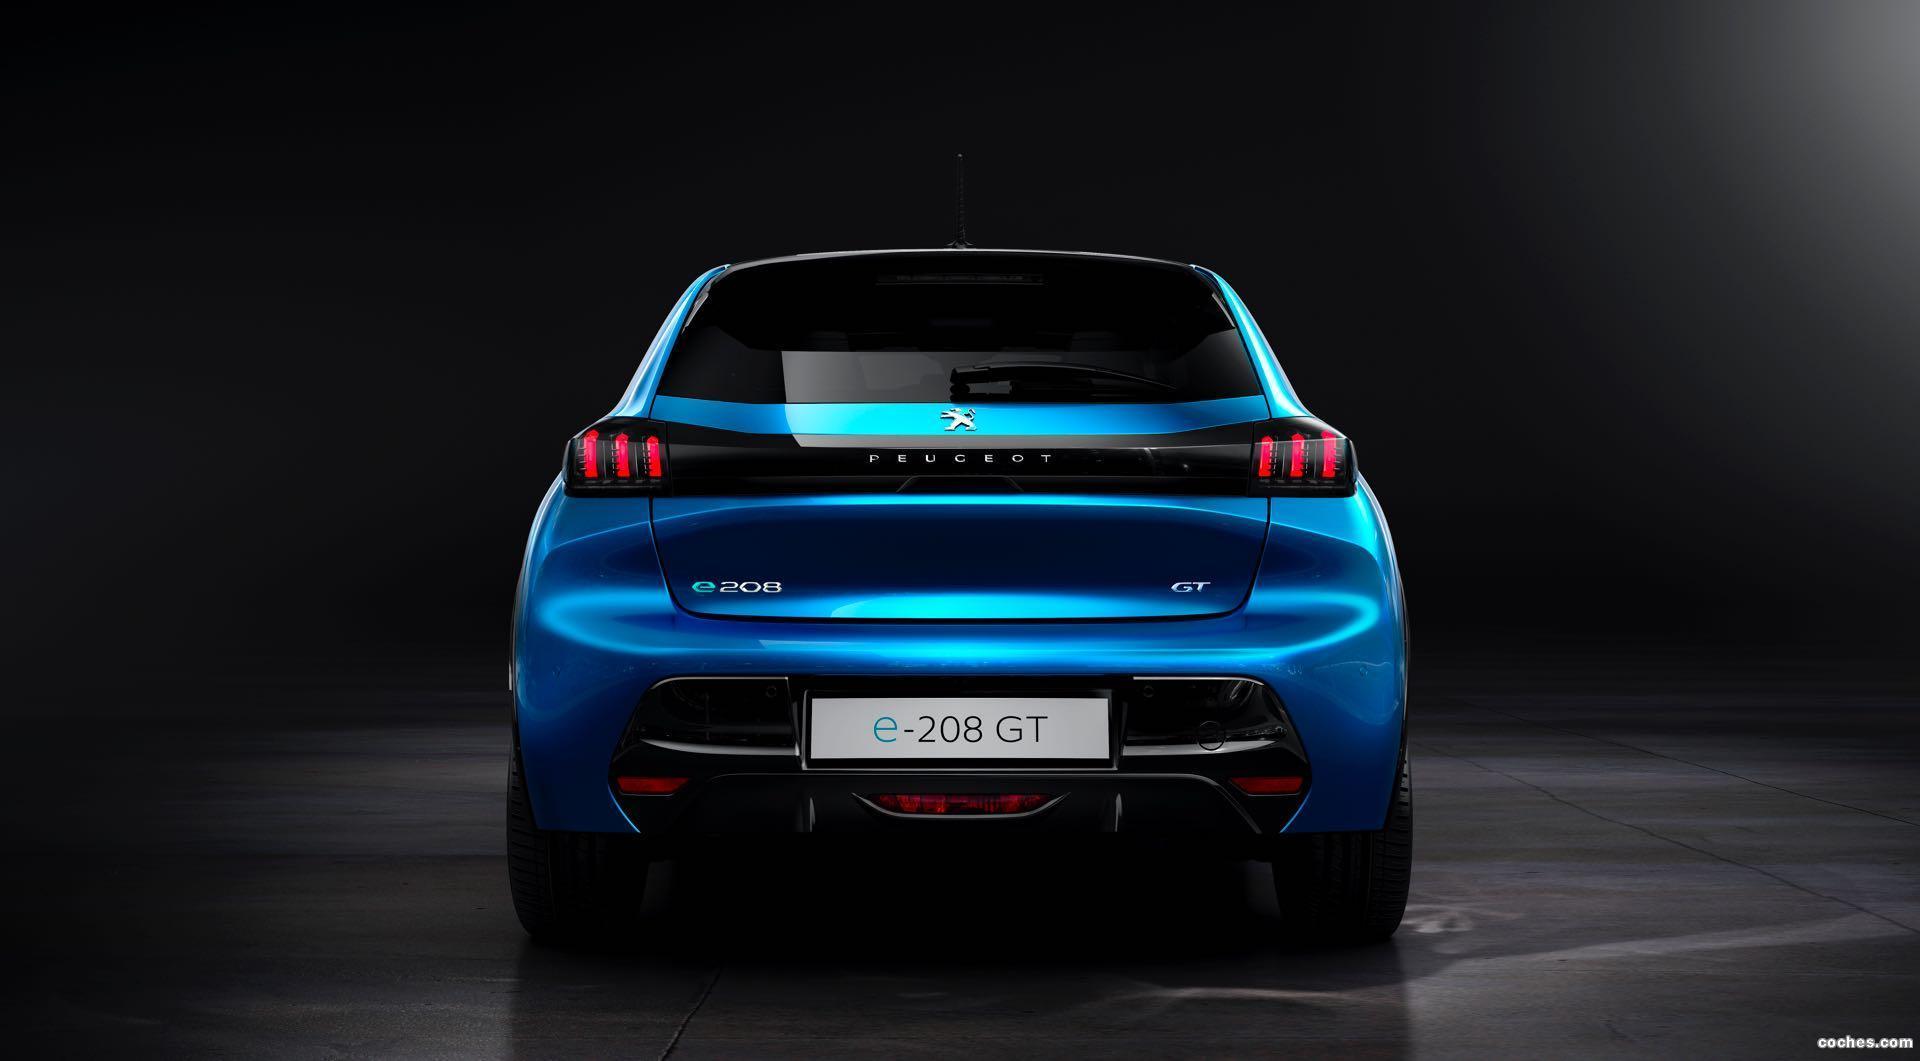 Foto 11 de Peugeot e-208 GT 2019